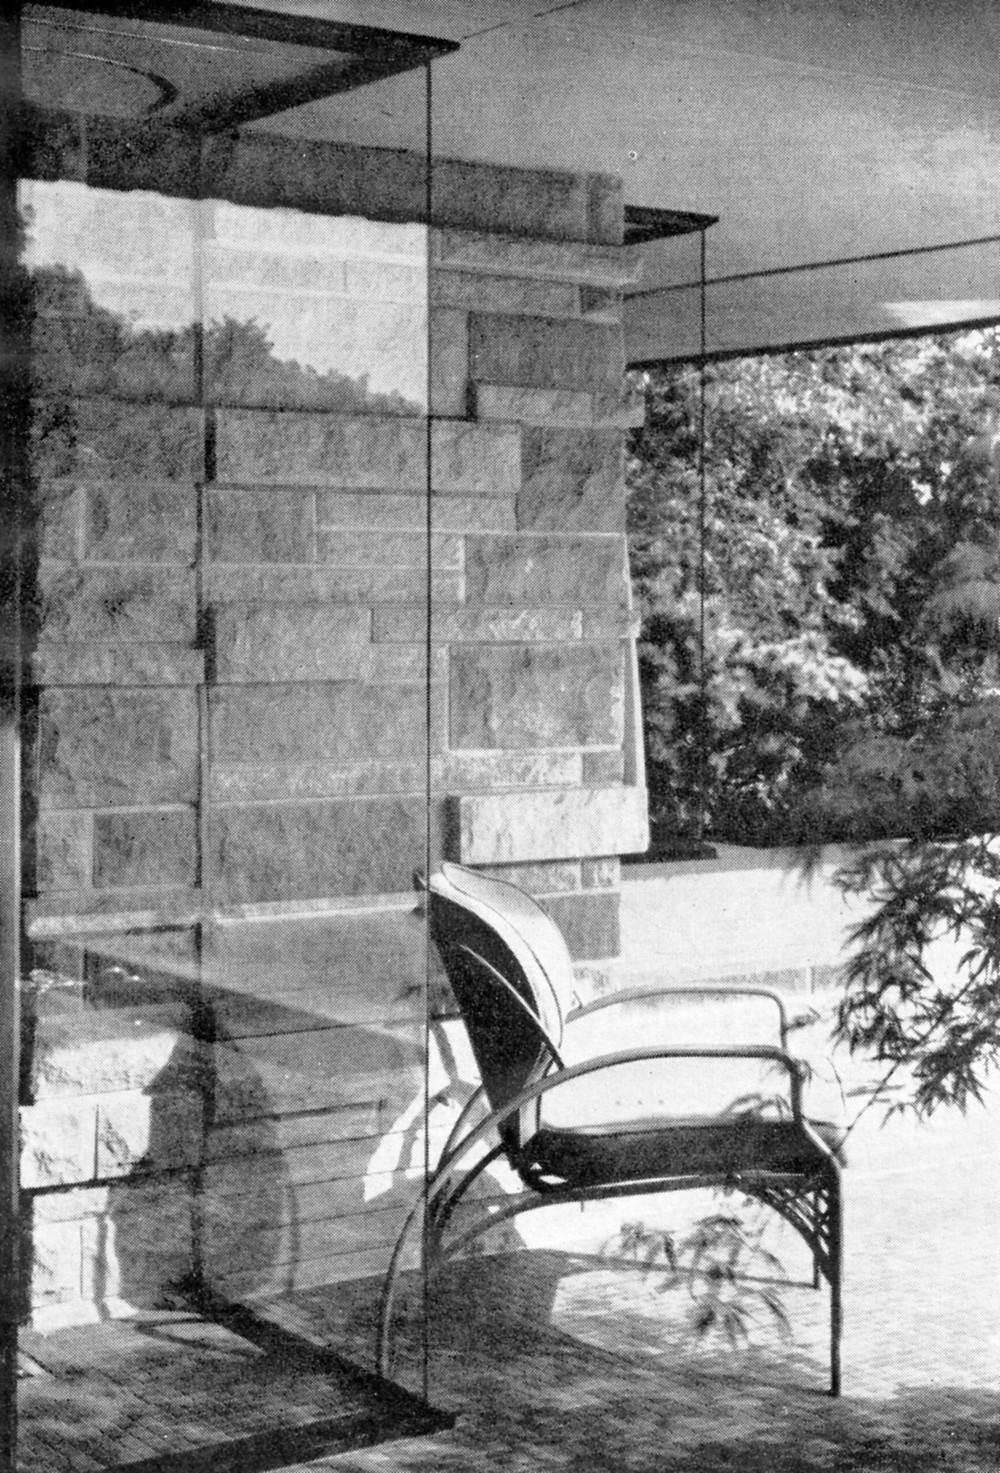 Interior view facing the porch